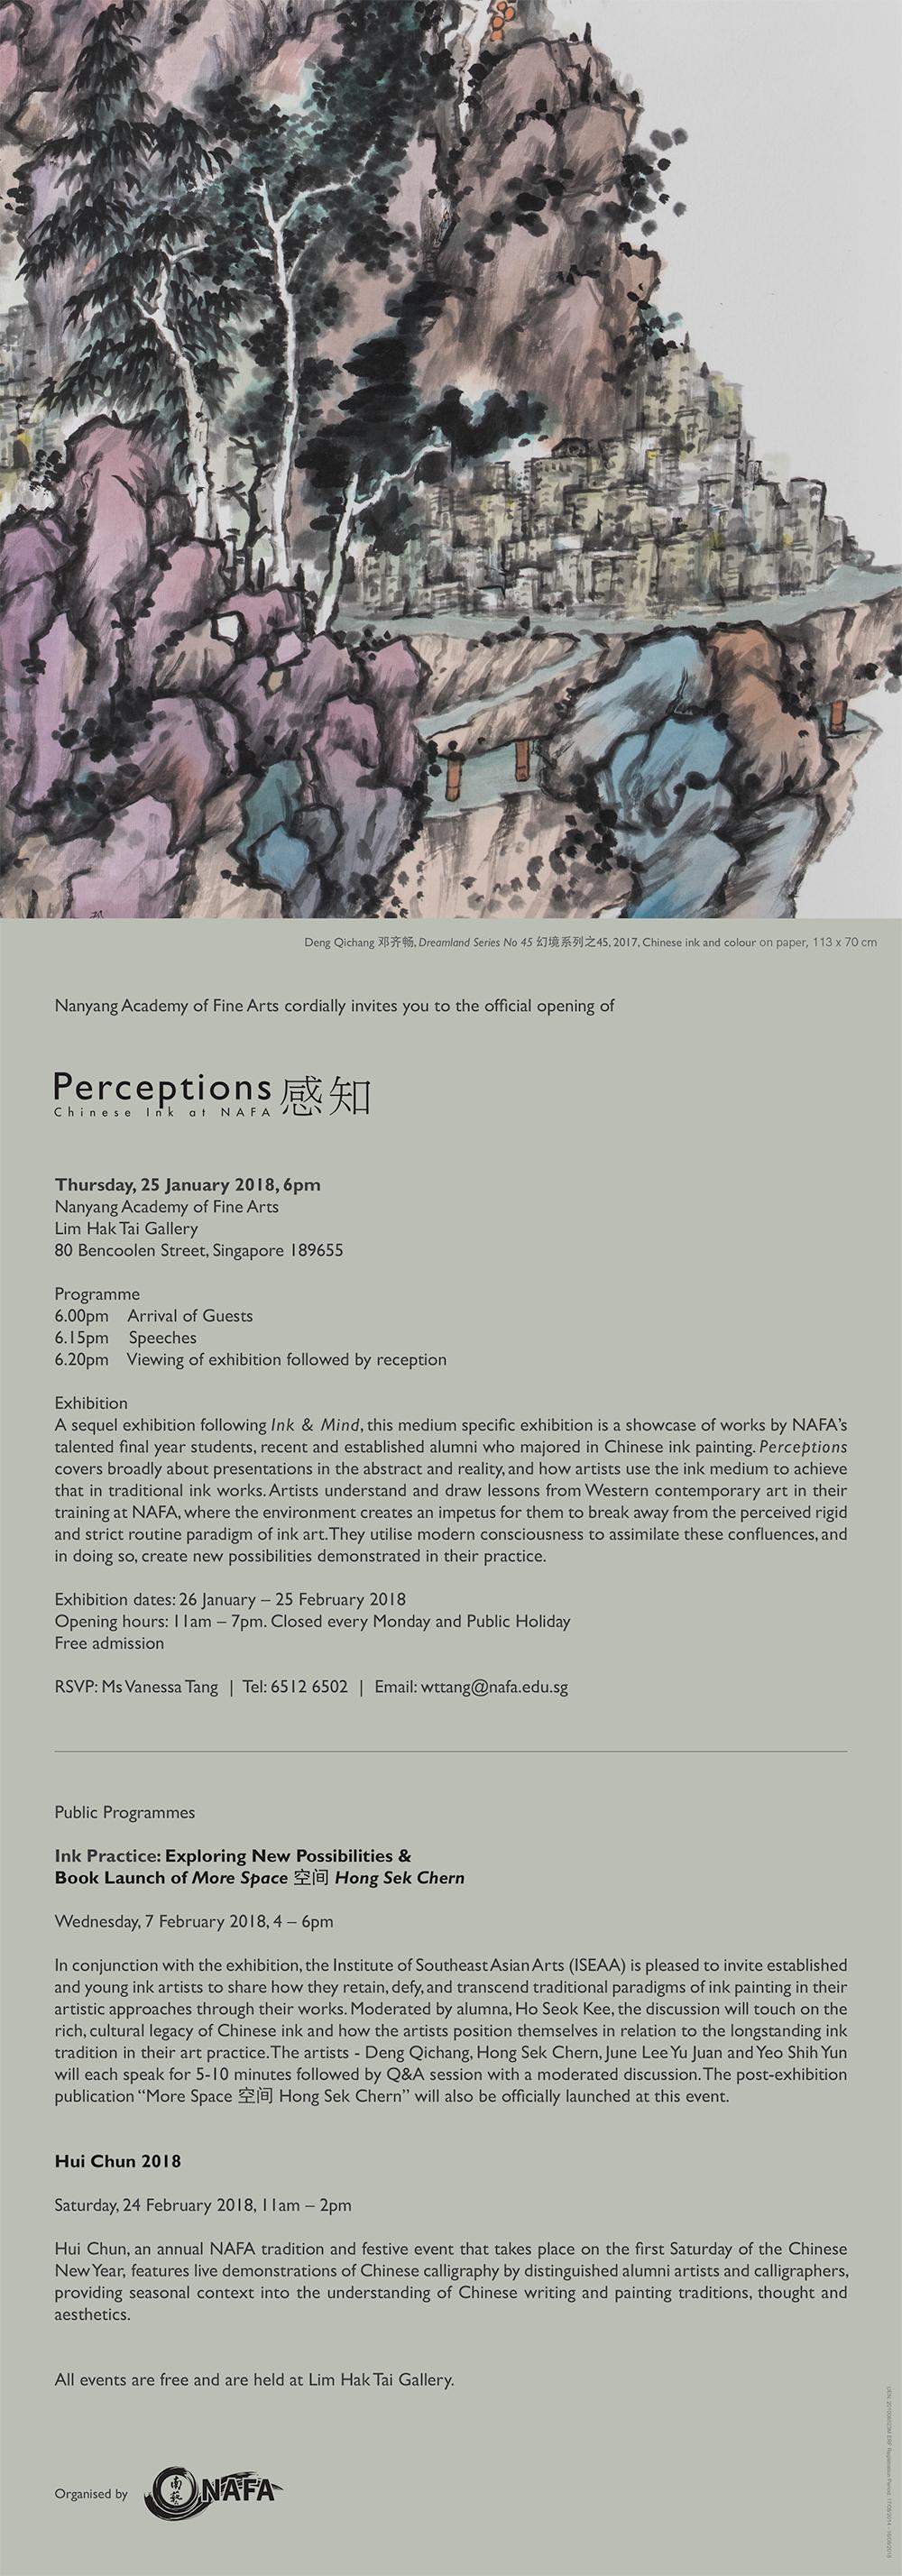 Perceptions invitation.png